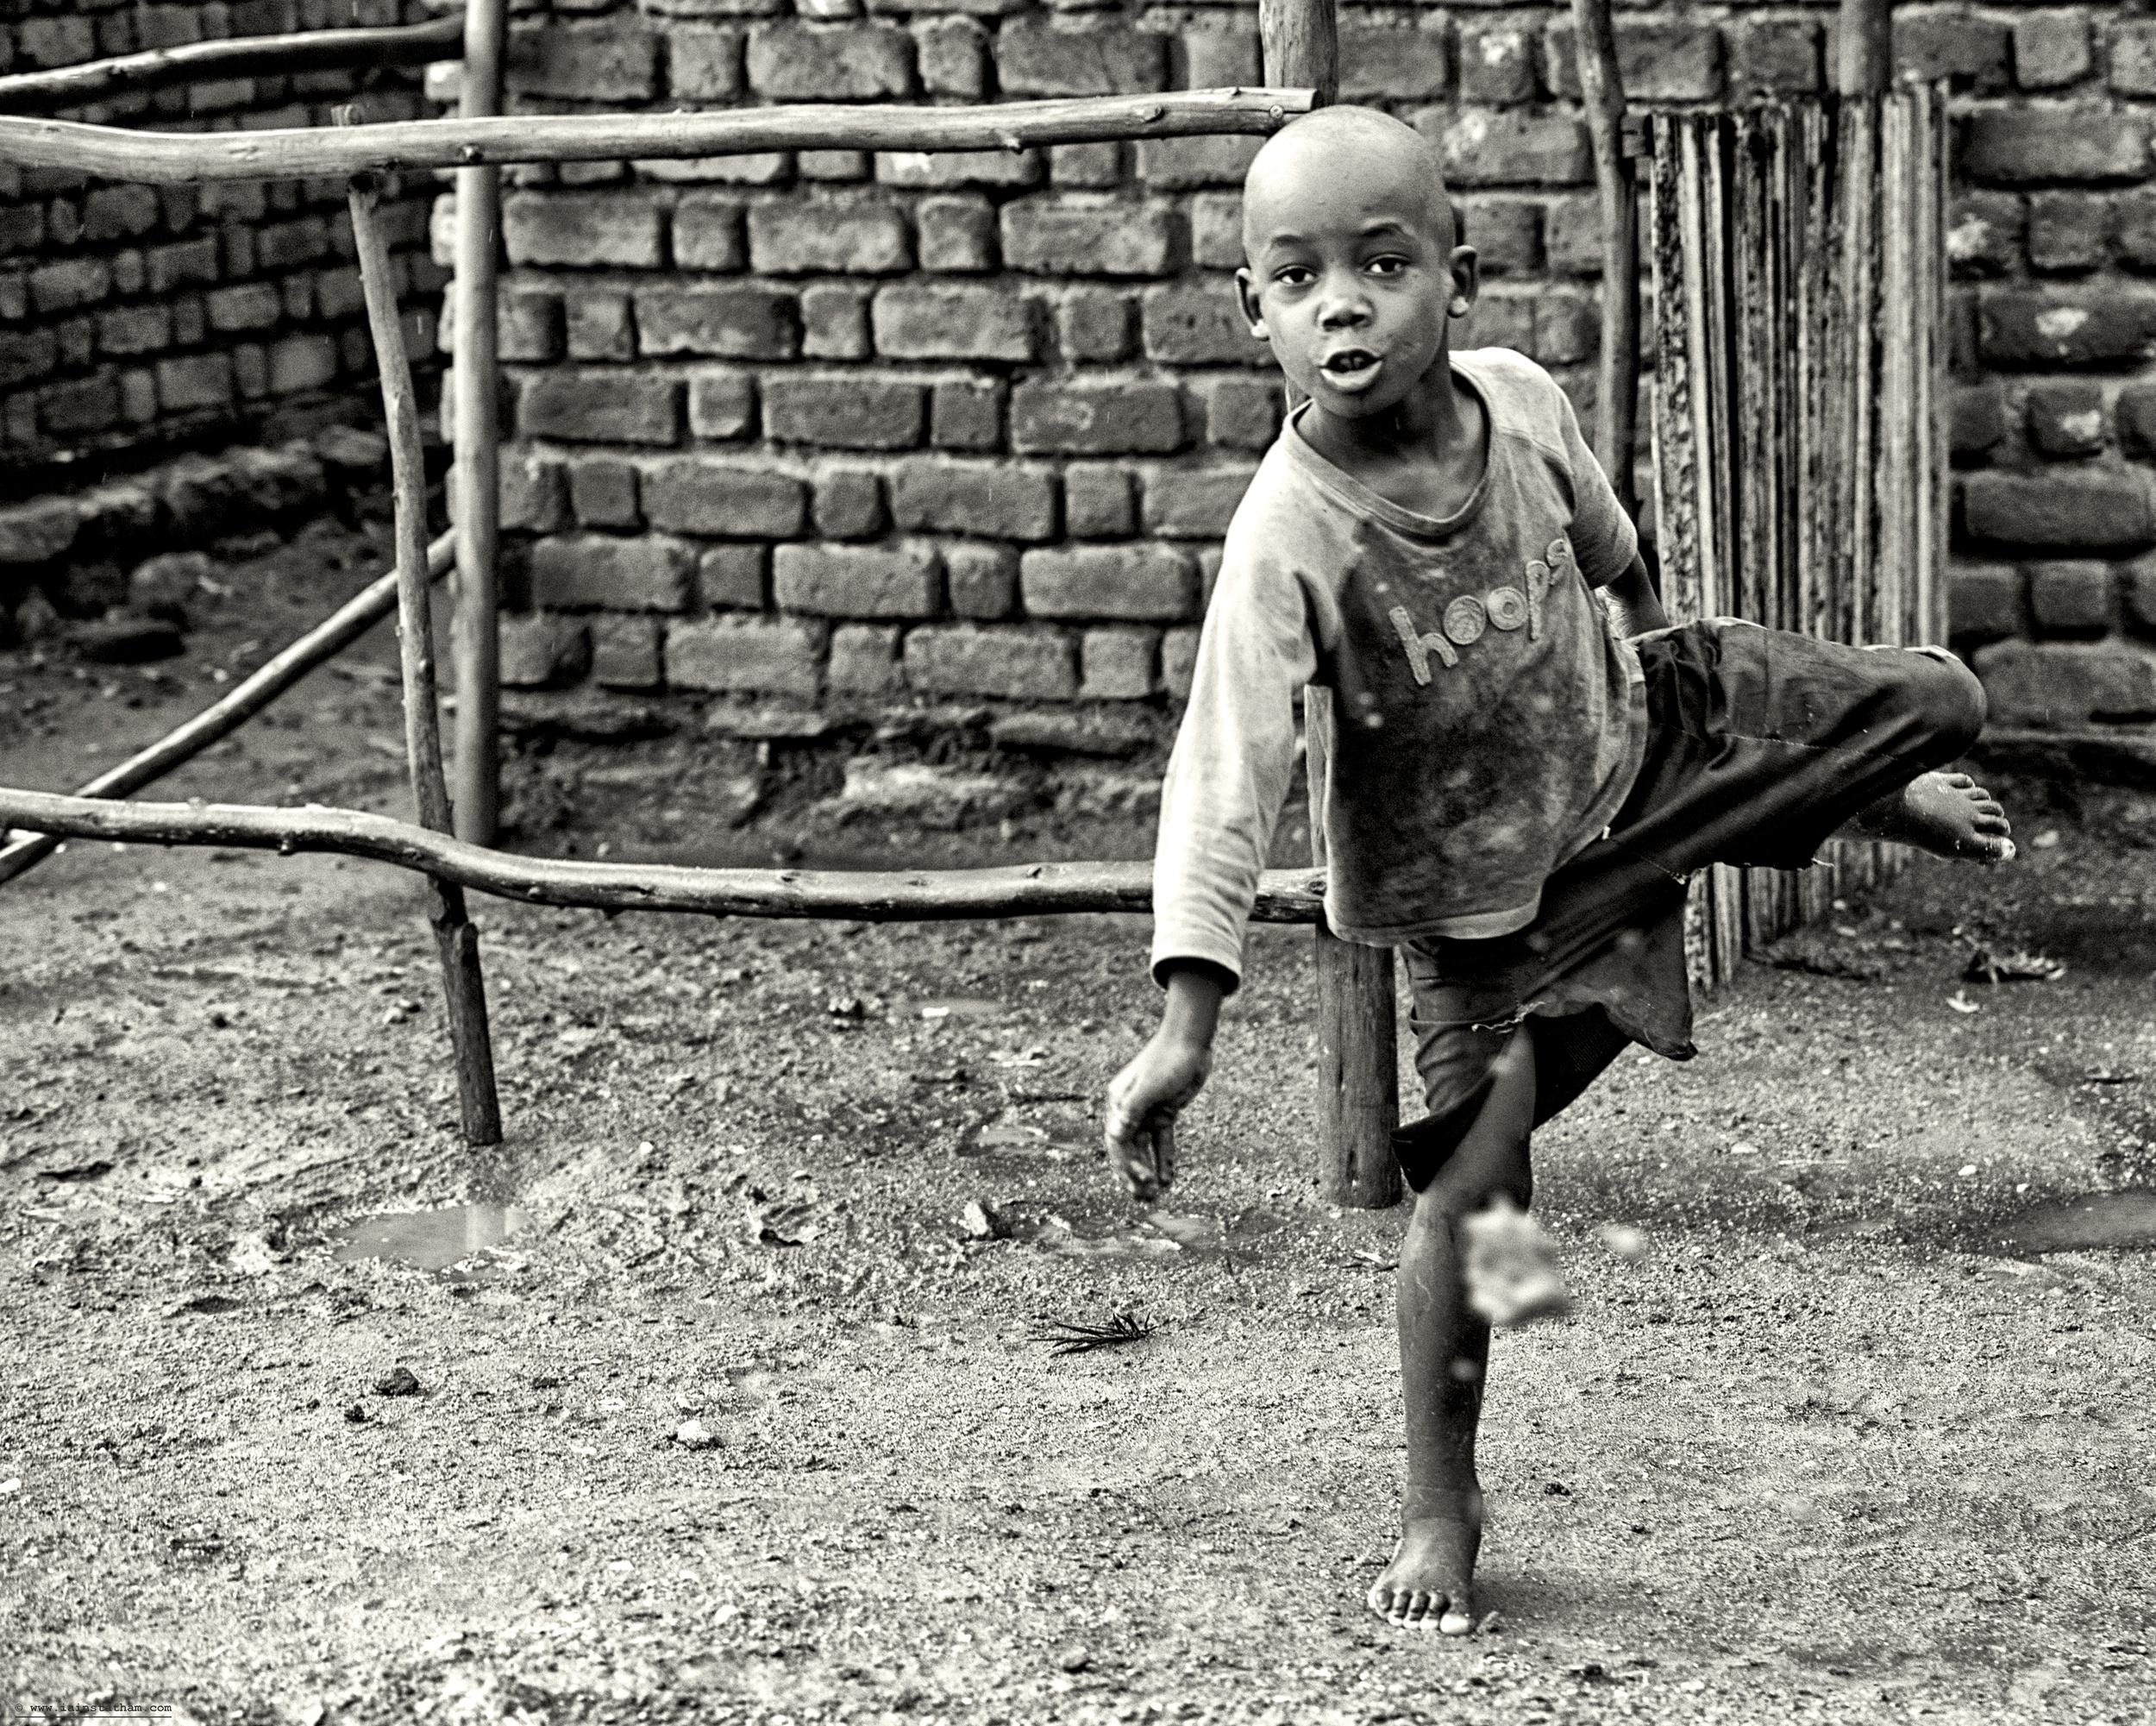 burundi bw feb 14 1.jpg